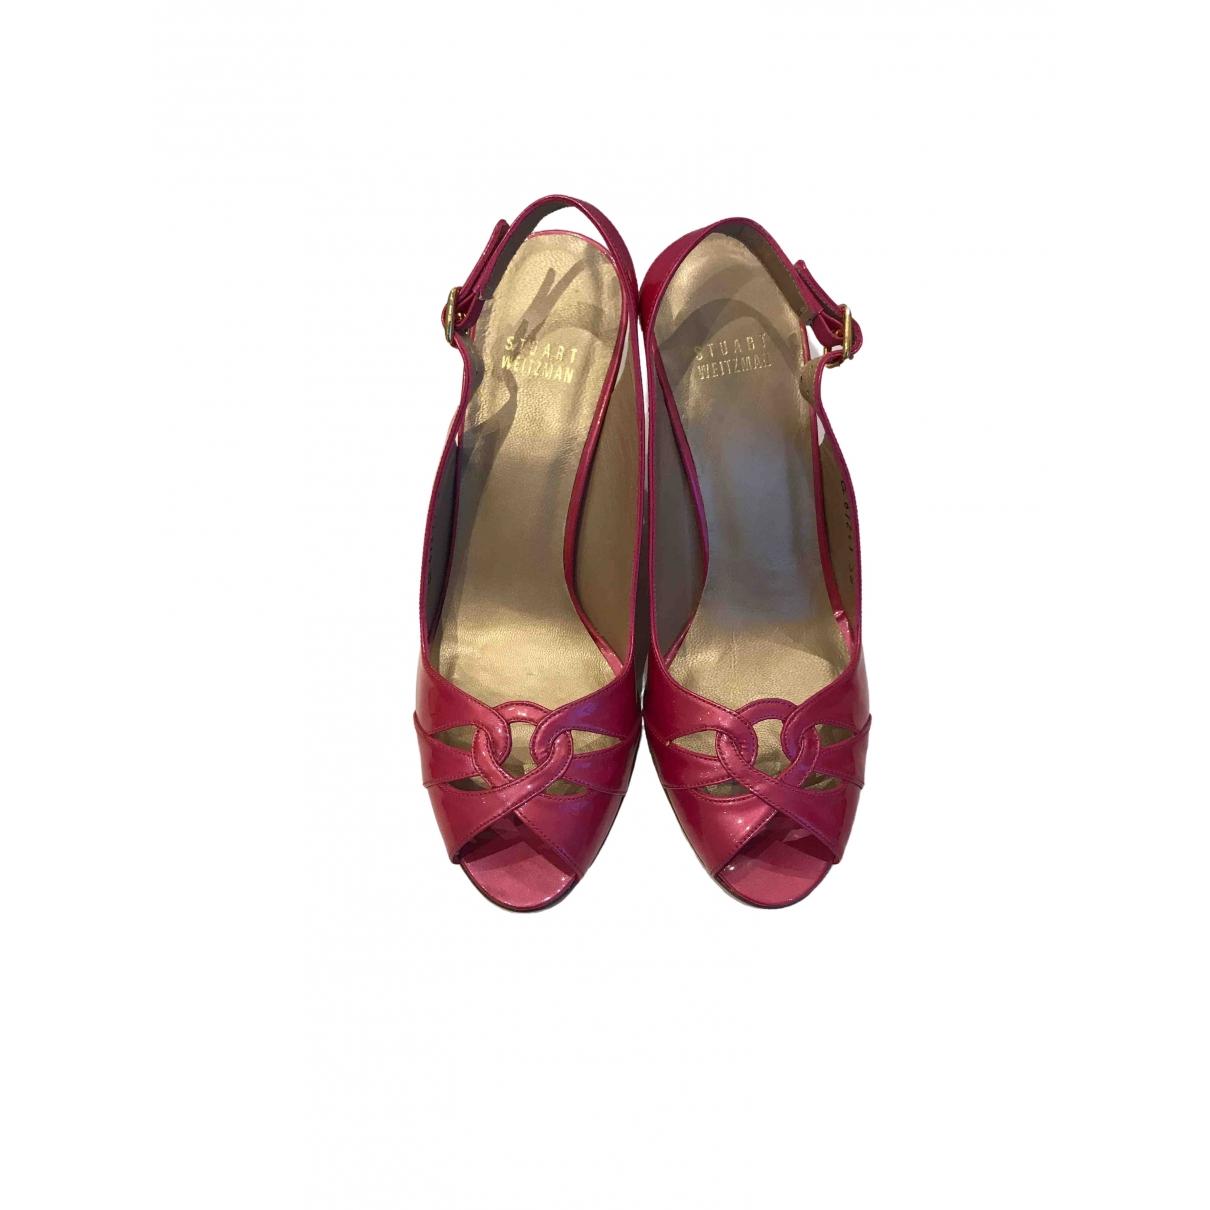 Stuart Weitzman \N Pink Patent leather Sandals for Women 38 EU